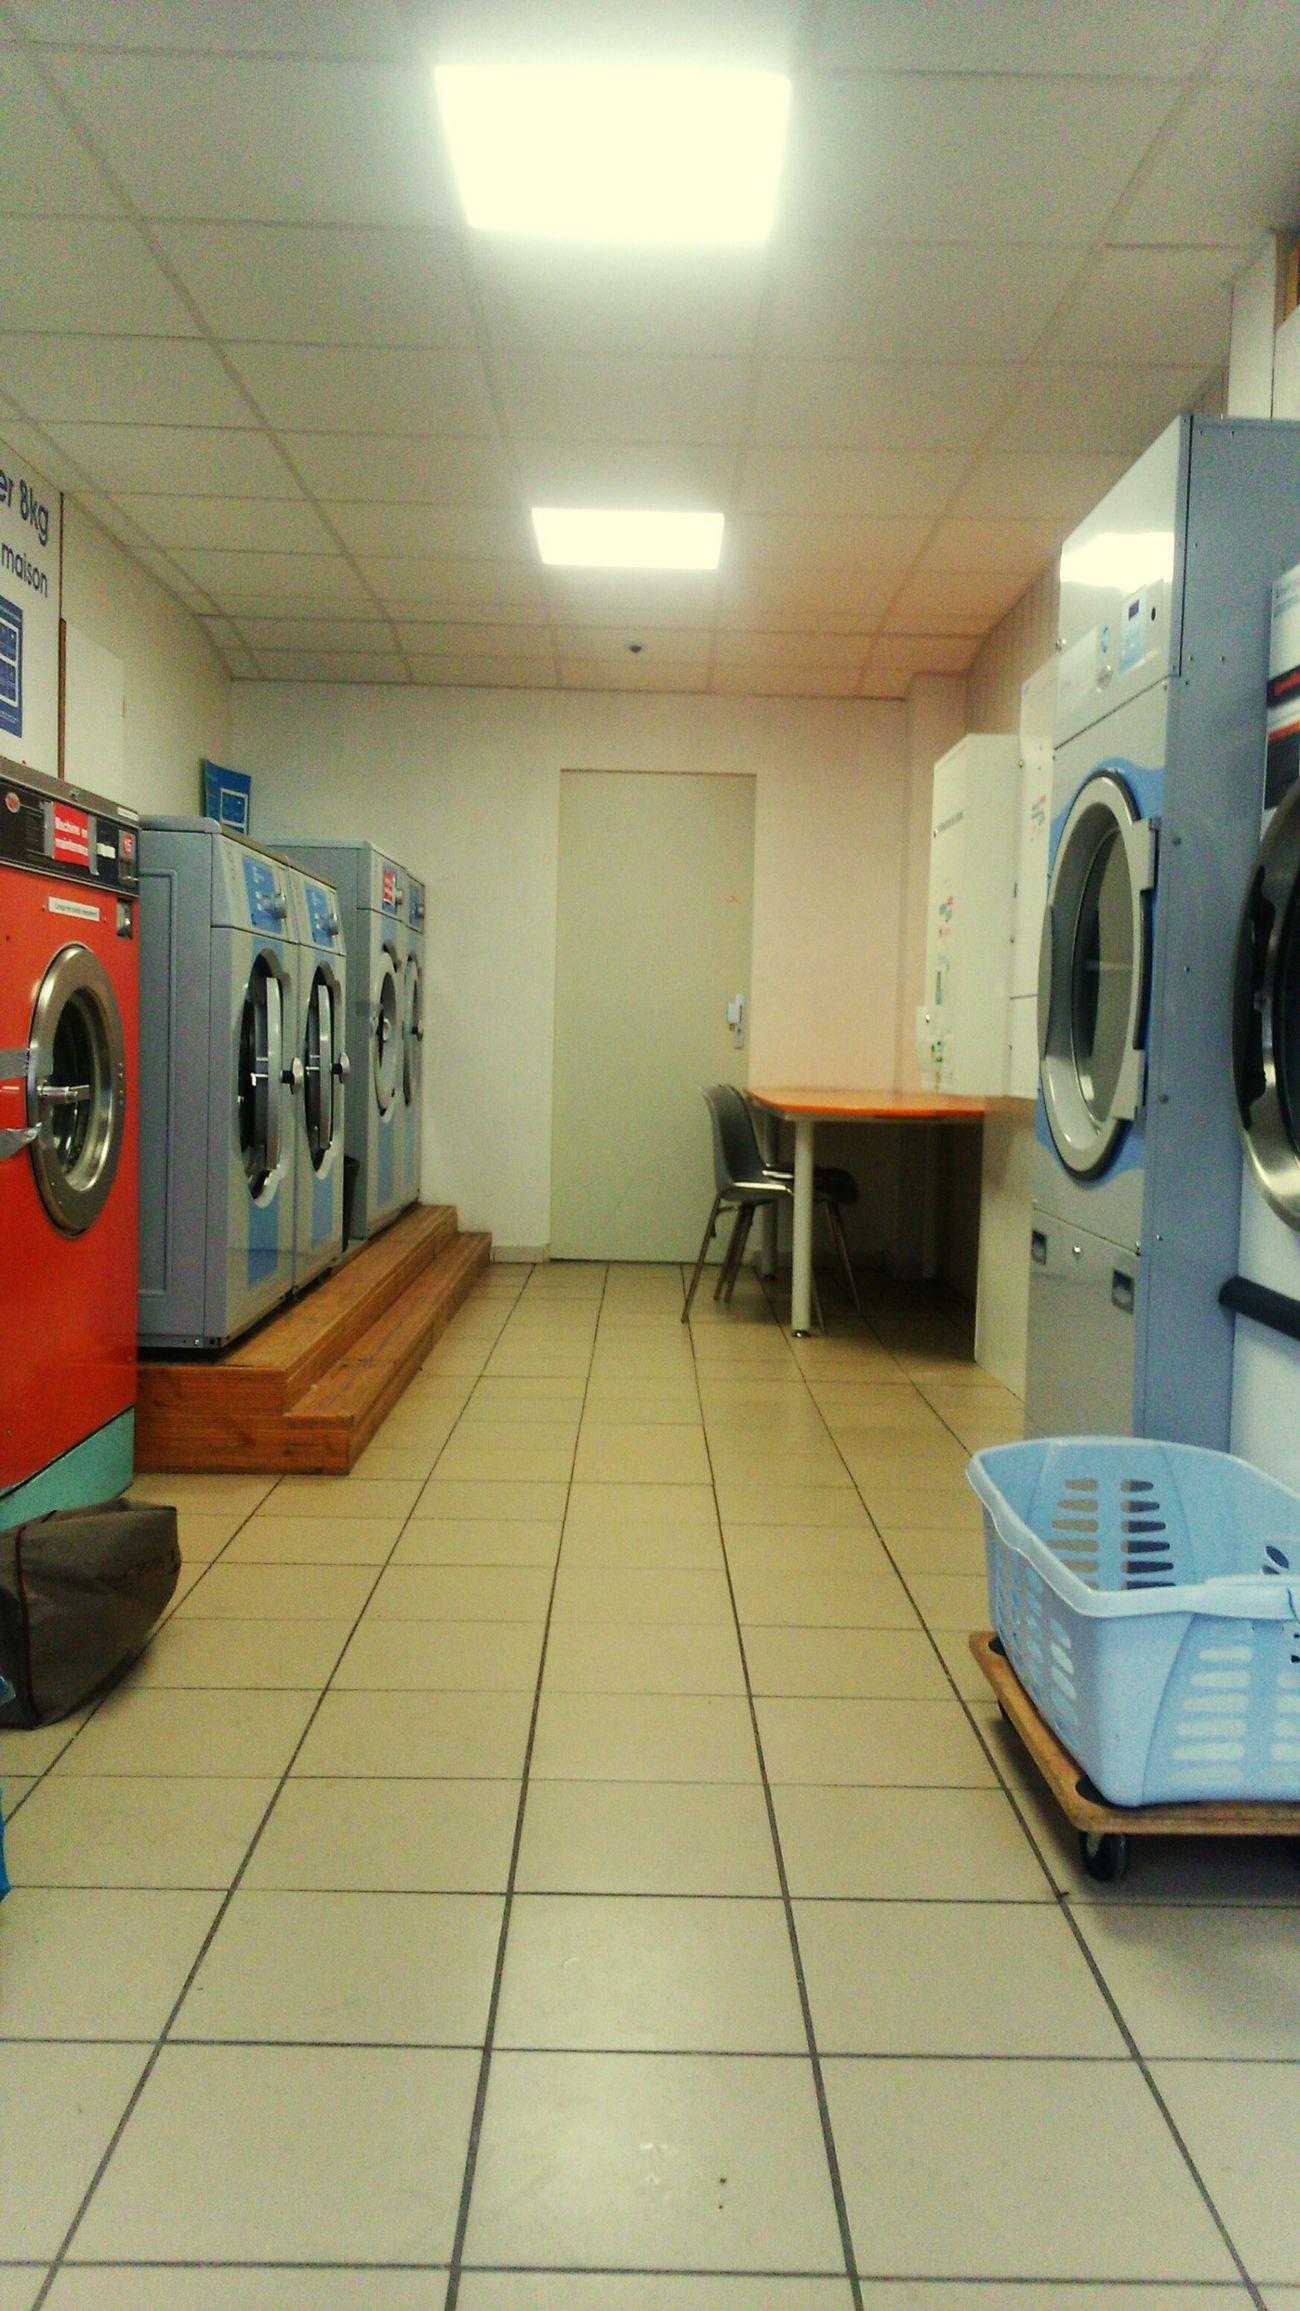 Dimanche laverie... No People Laverie Dimanche Washing Machine